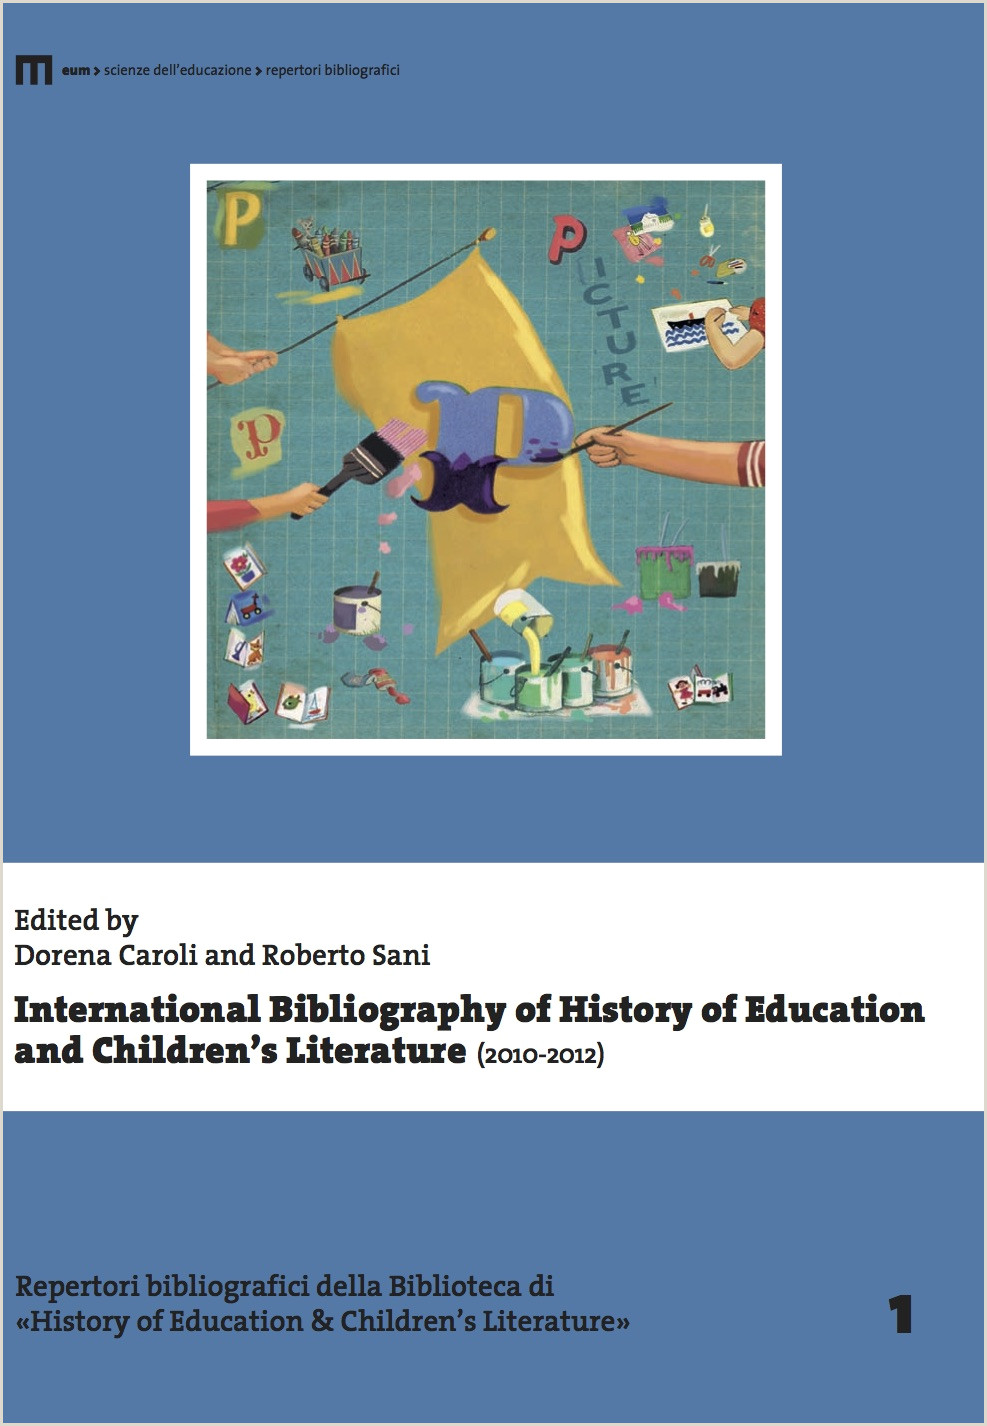 Caroli D & Sani L Eds International Bibliography of